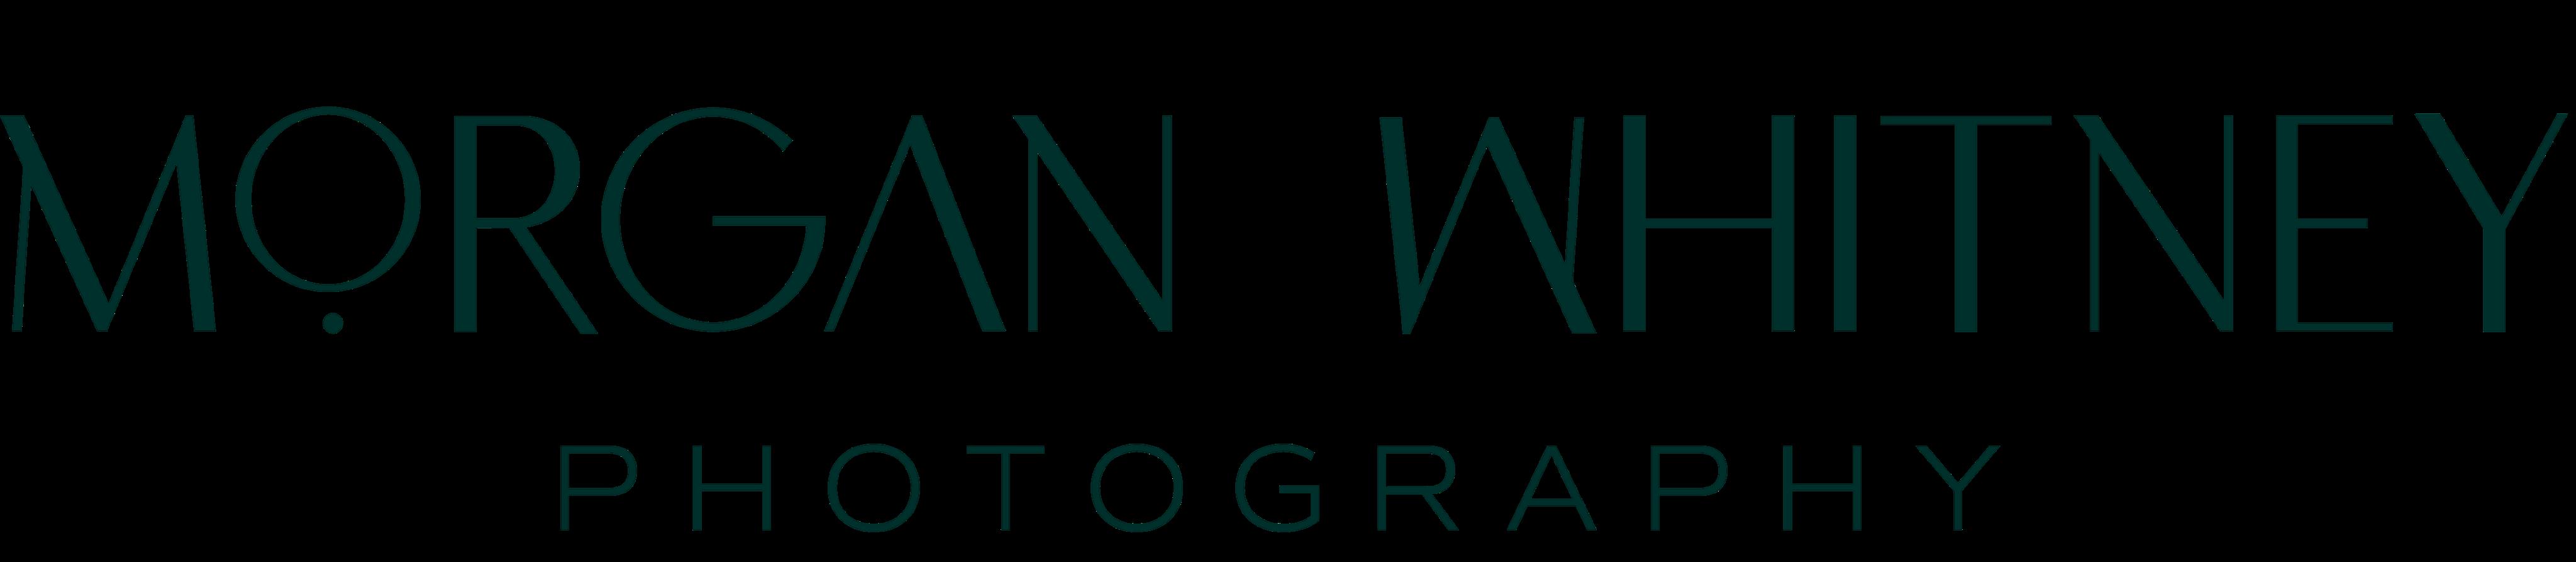 Morgan Whitney Photography